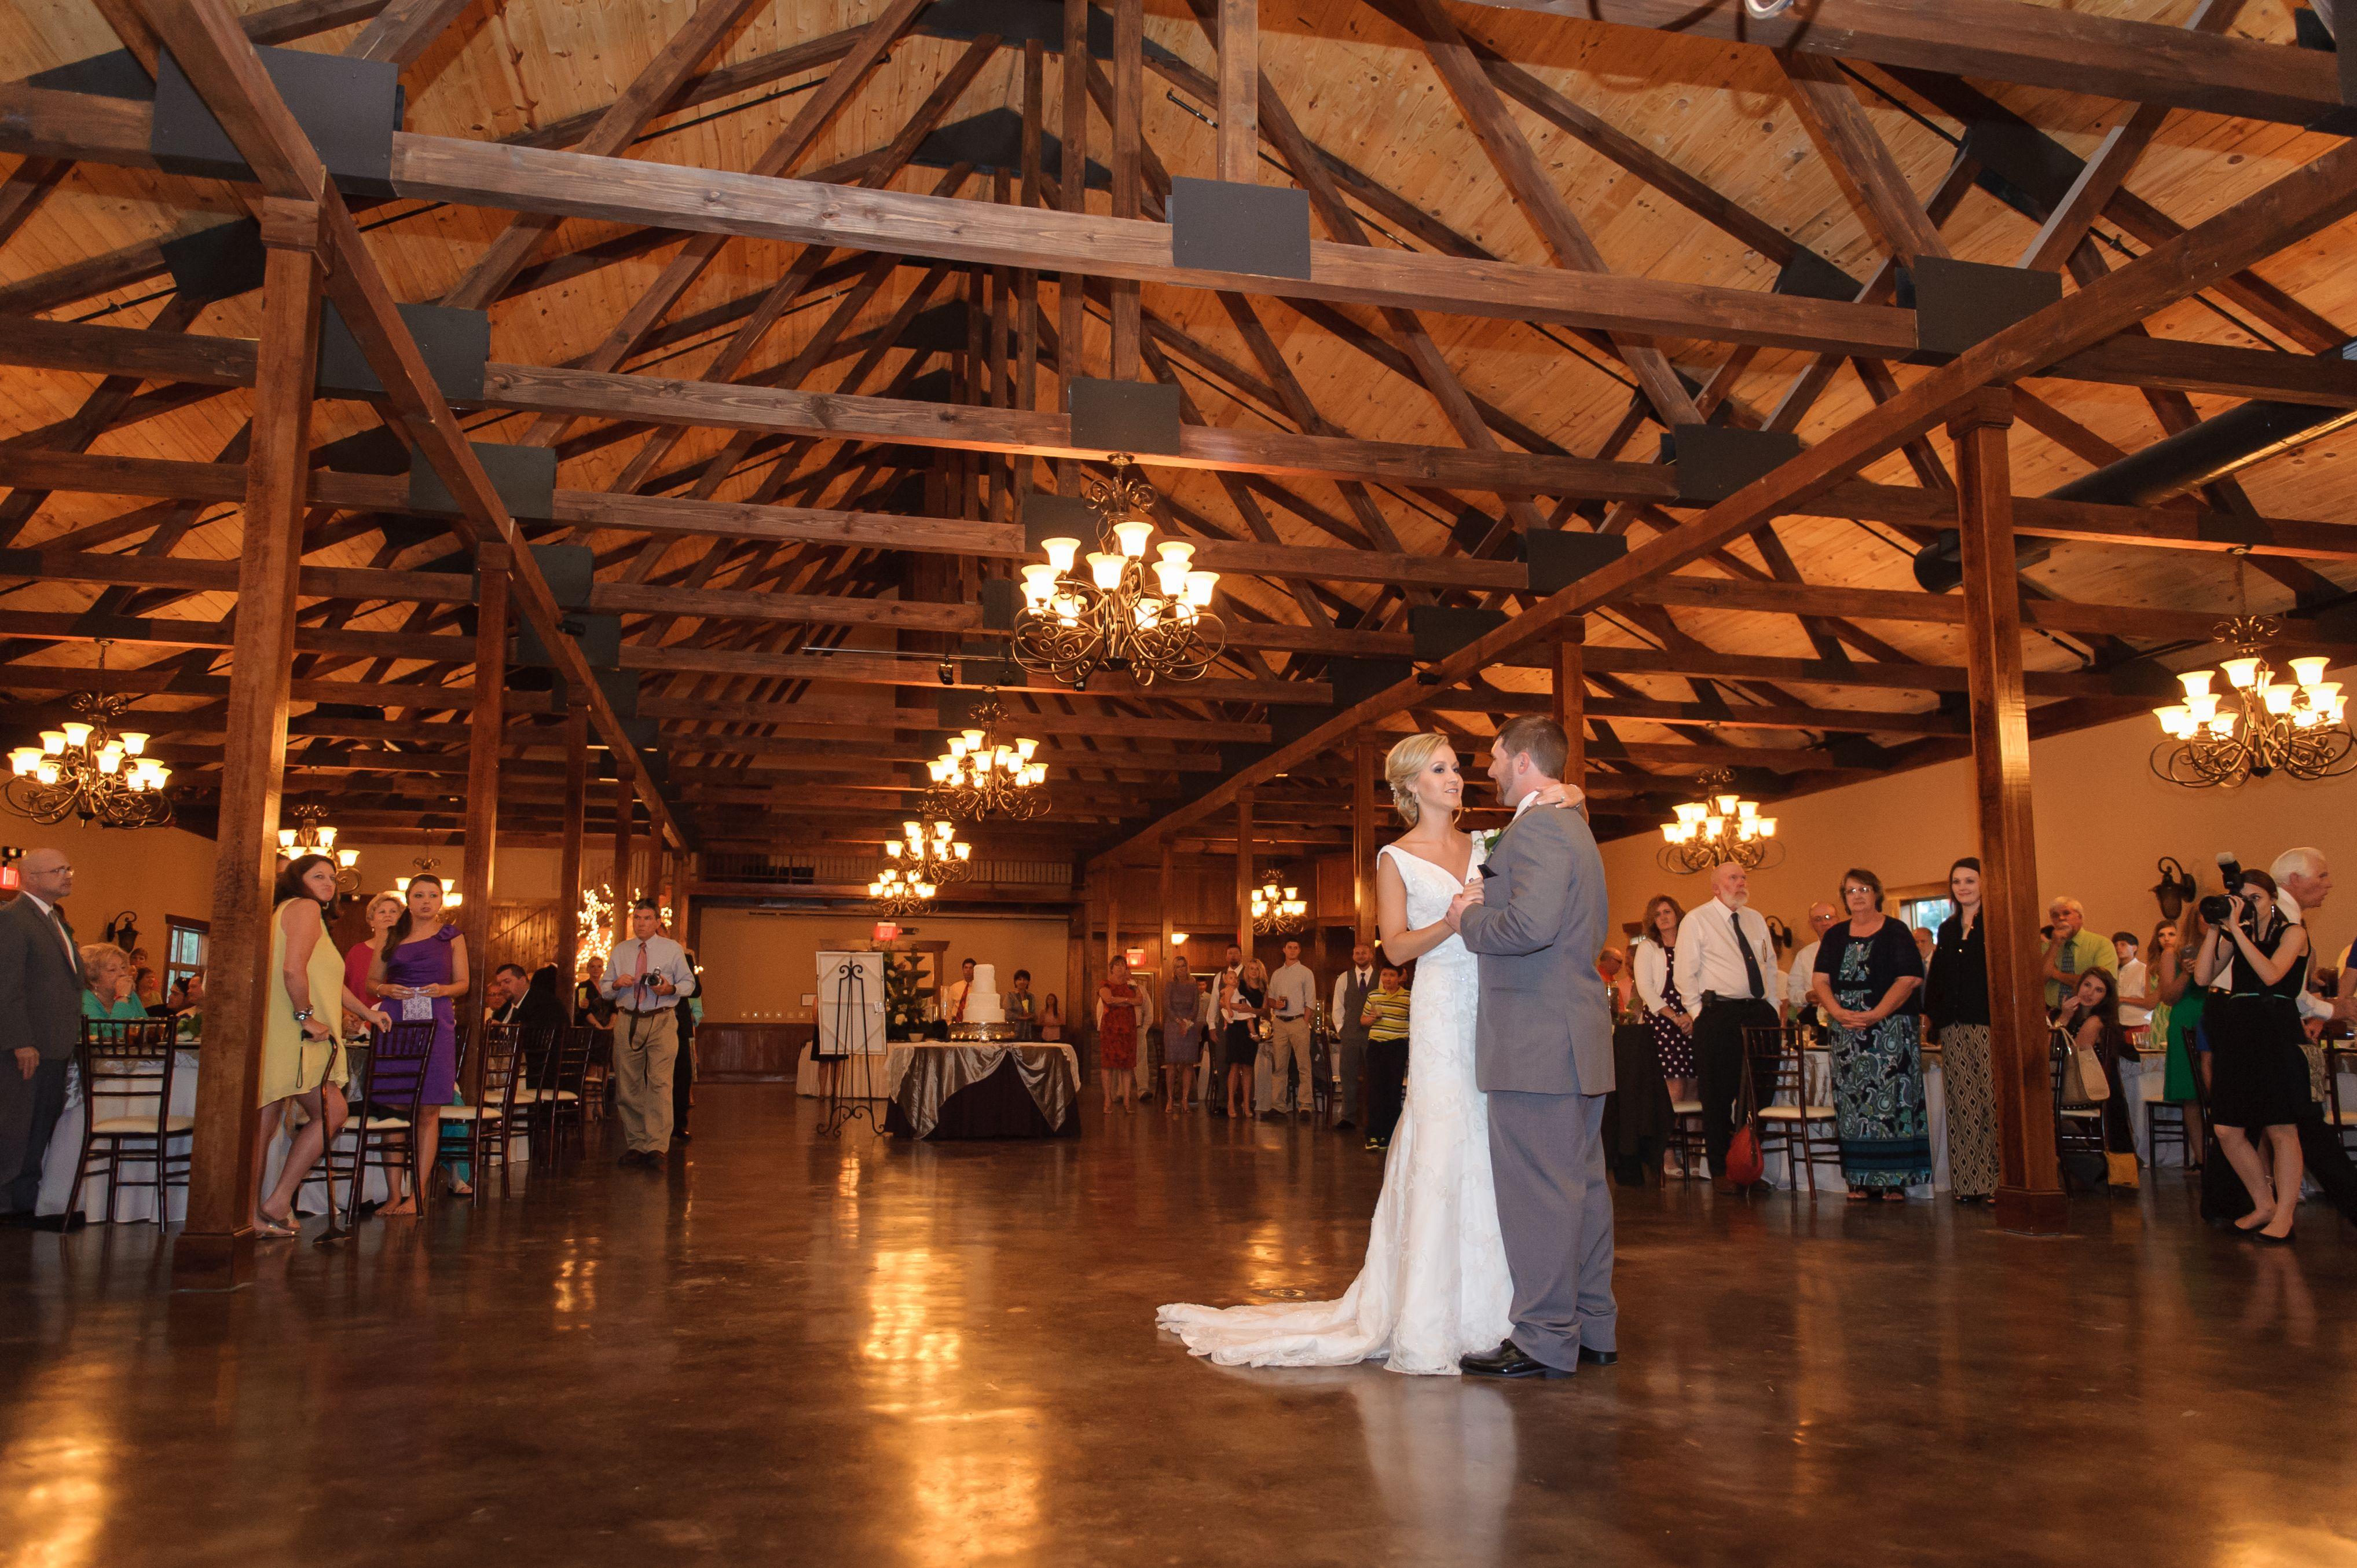 Stone Bridge Farms Wedding Wedding Reception First Dance Bride And Groom Wedding Photography Wedding Photographer Wedding Wedding Portraits Wedding Places